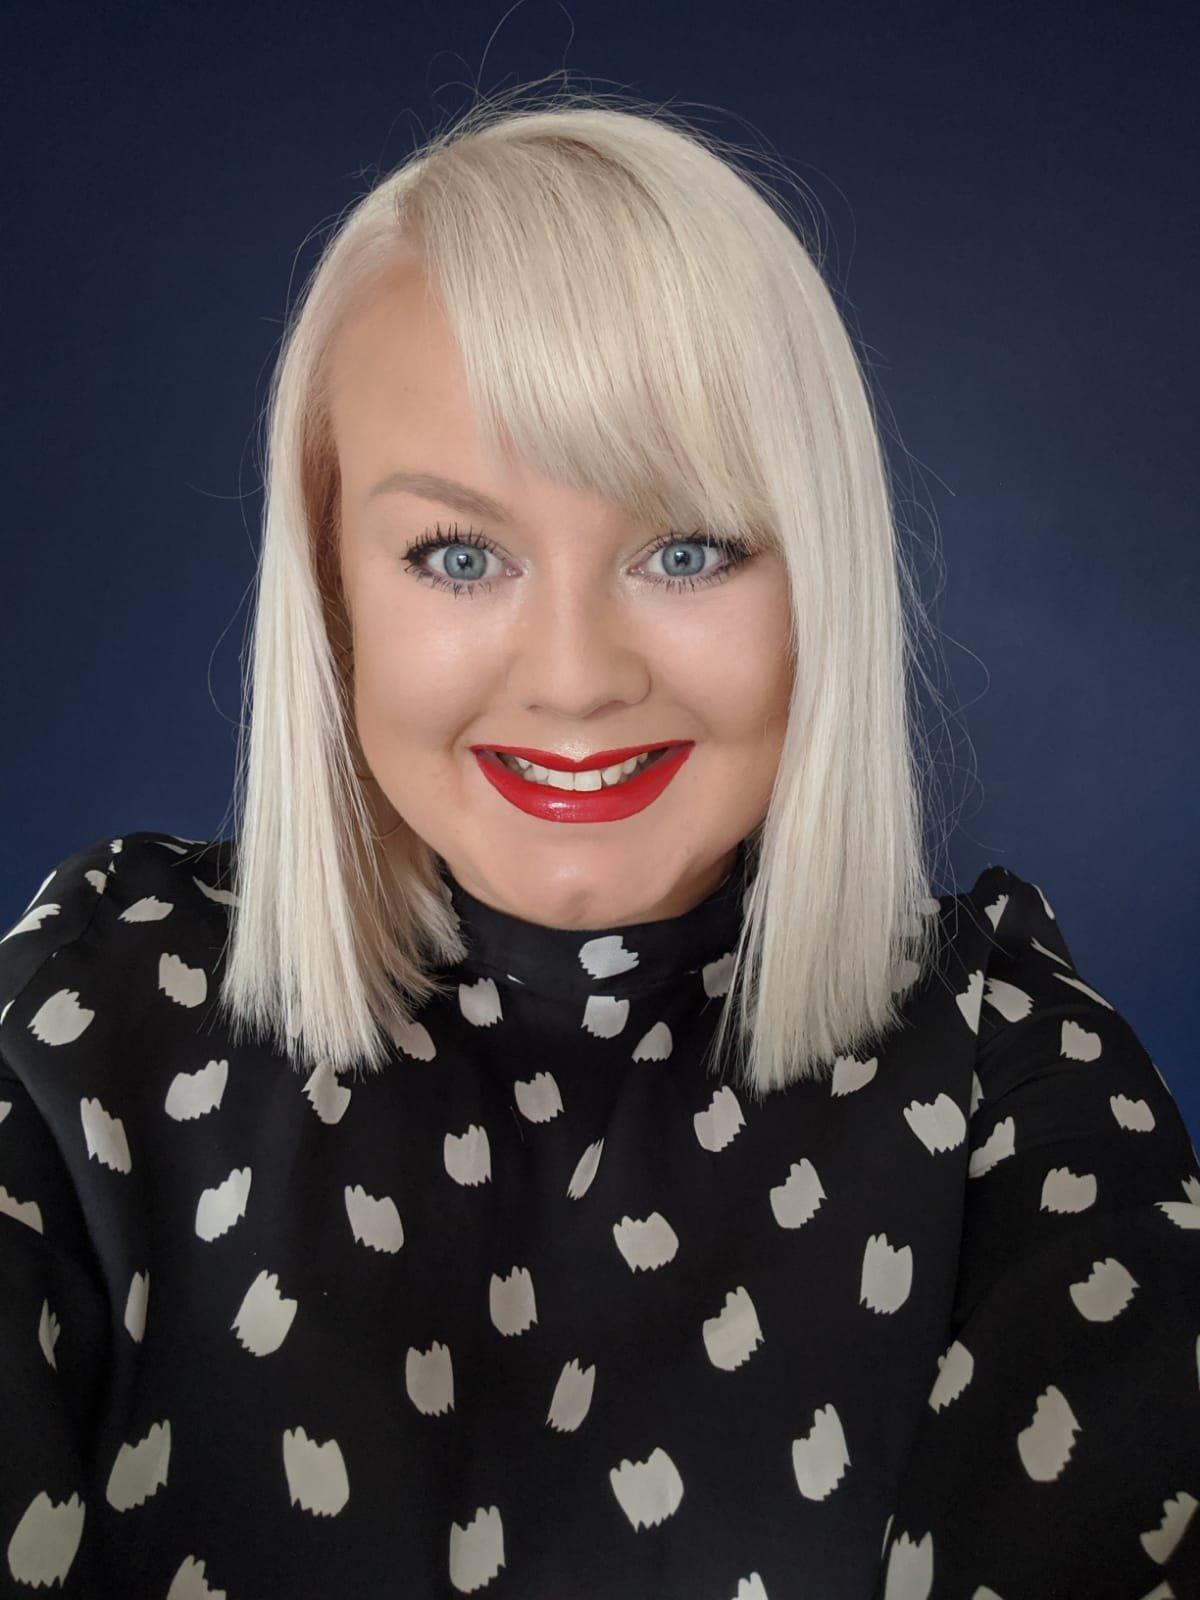 Eden Appoints New Head of Digital & Social